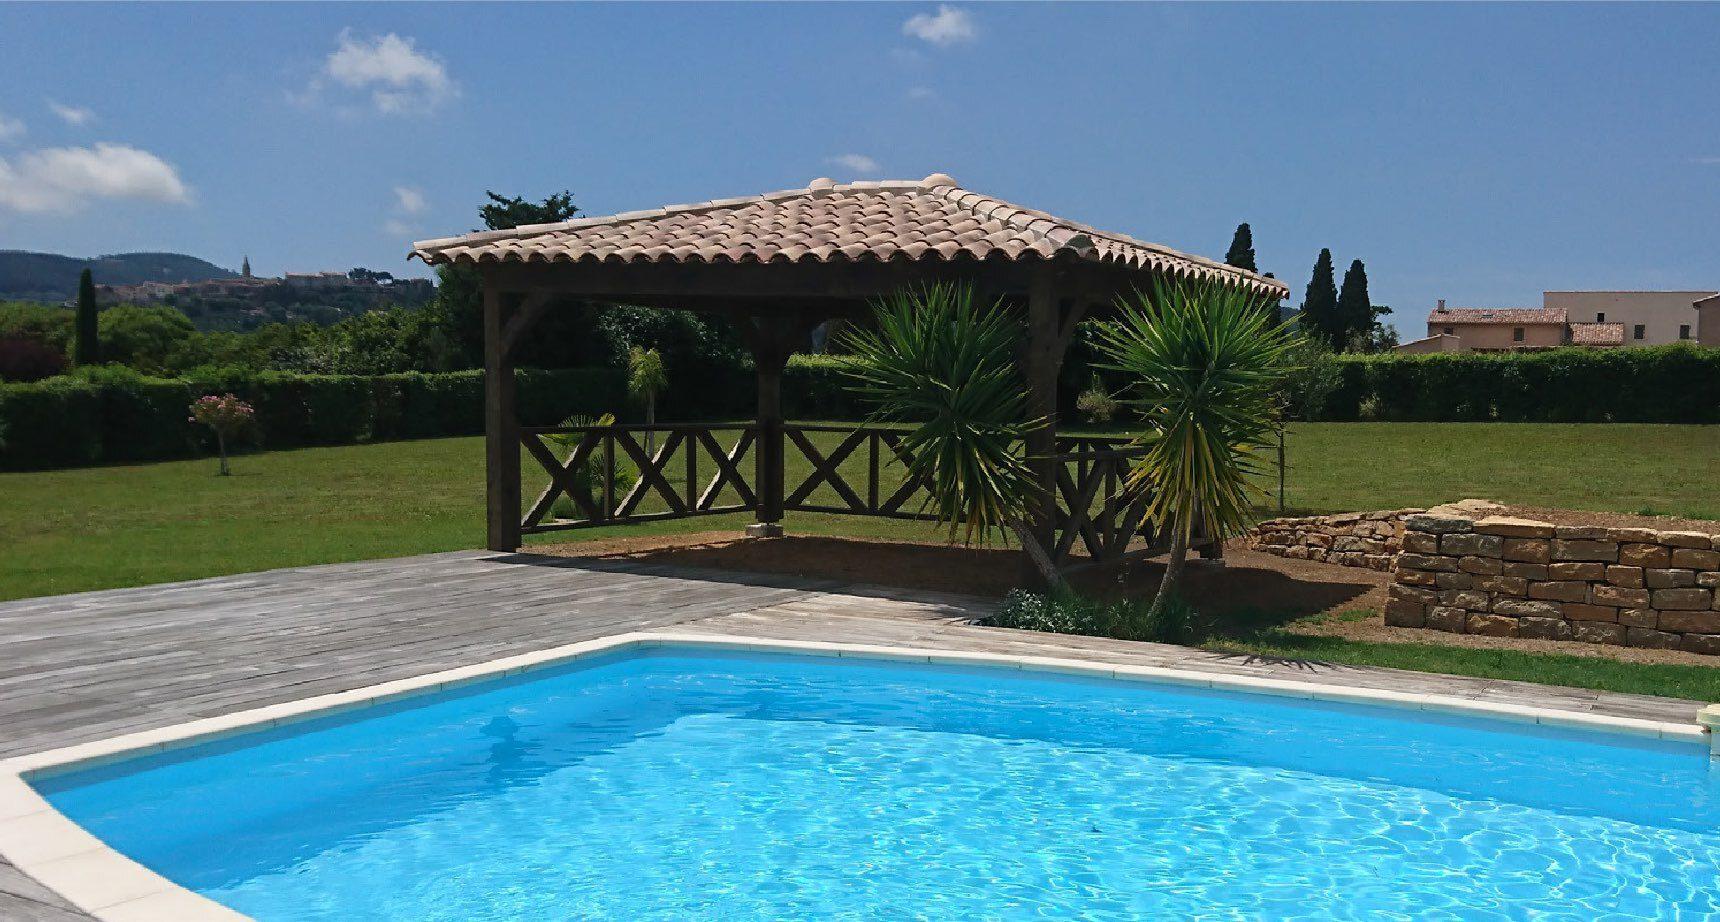 Pool house